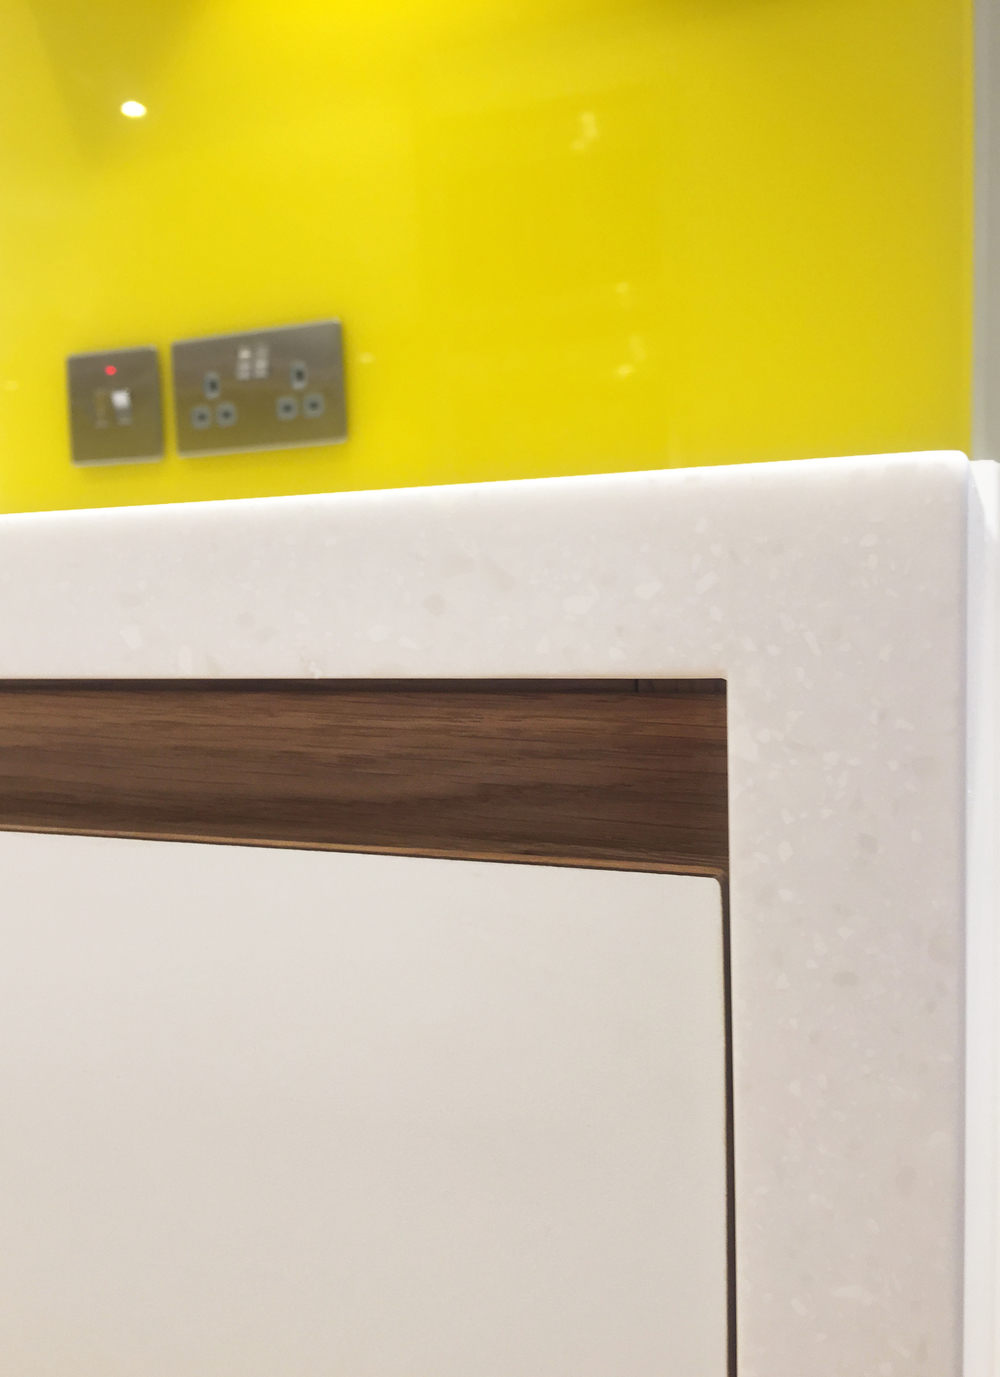 Square-One-Design-kitchen-oak-Antartica-corian-Formica-glass-yellow-1.jpg